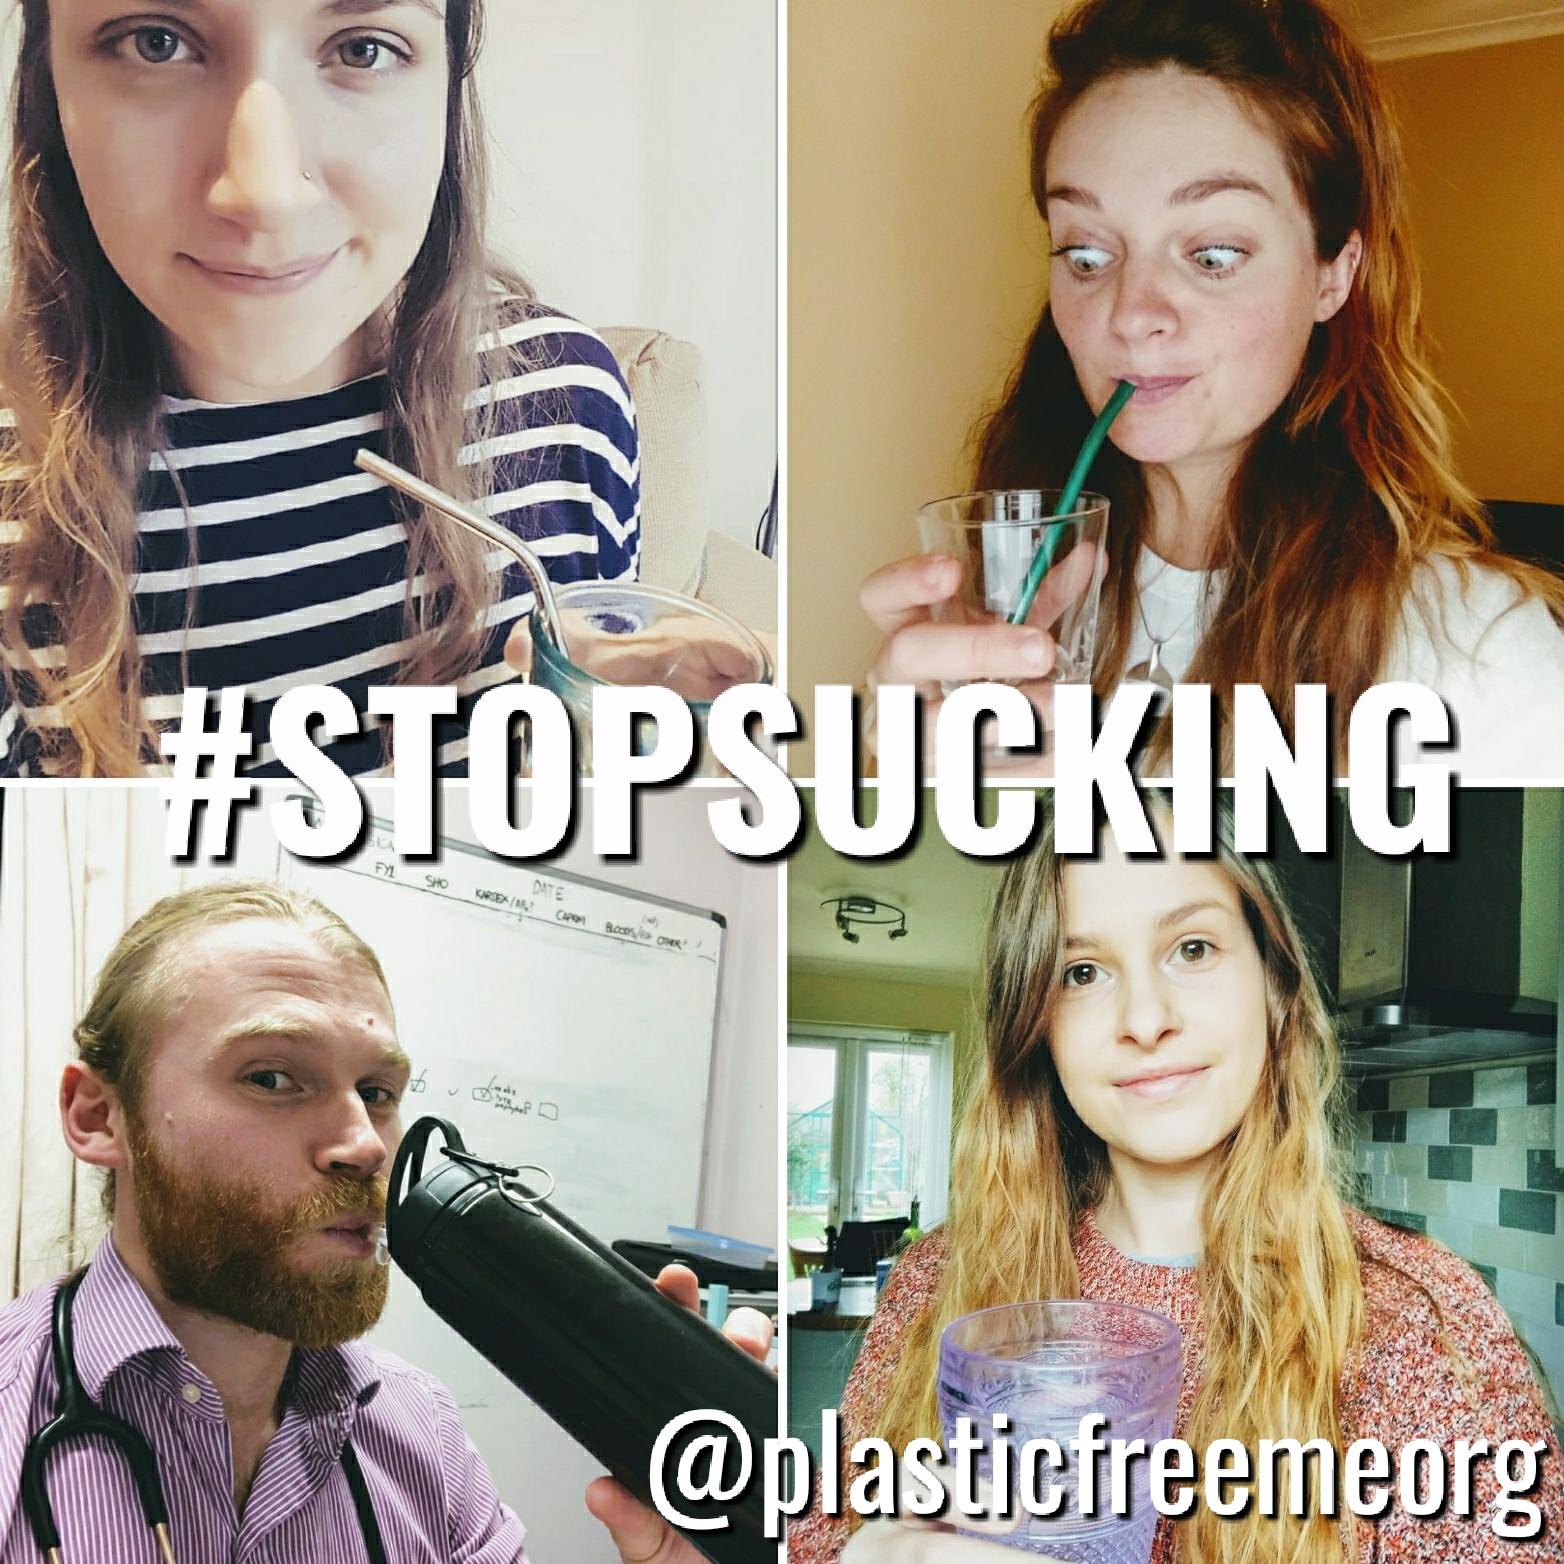 #STOPSUCKING photo campaign